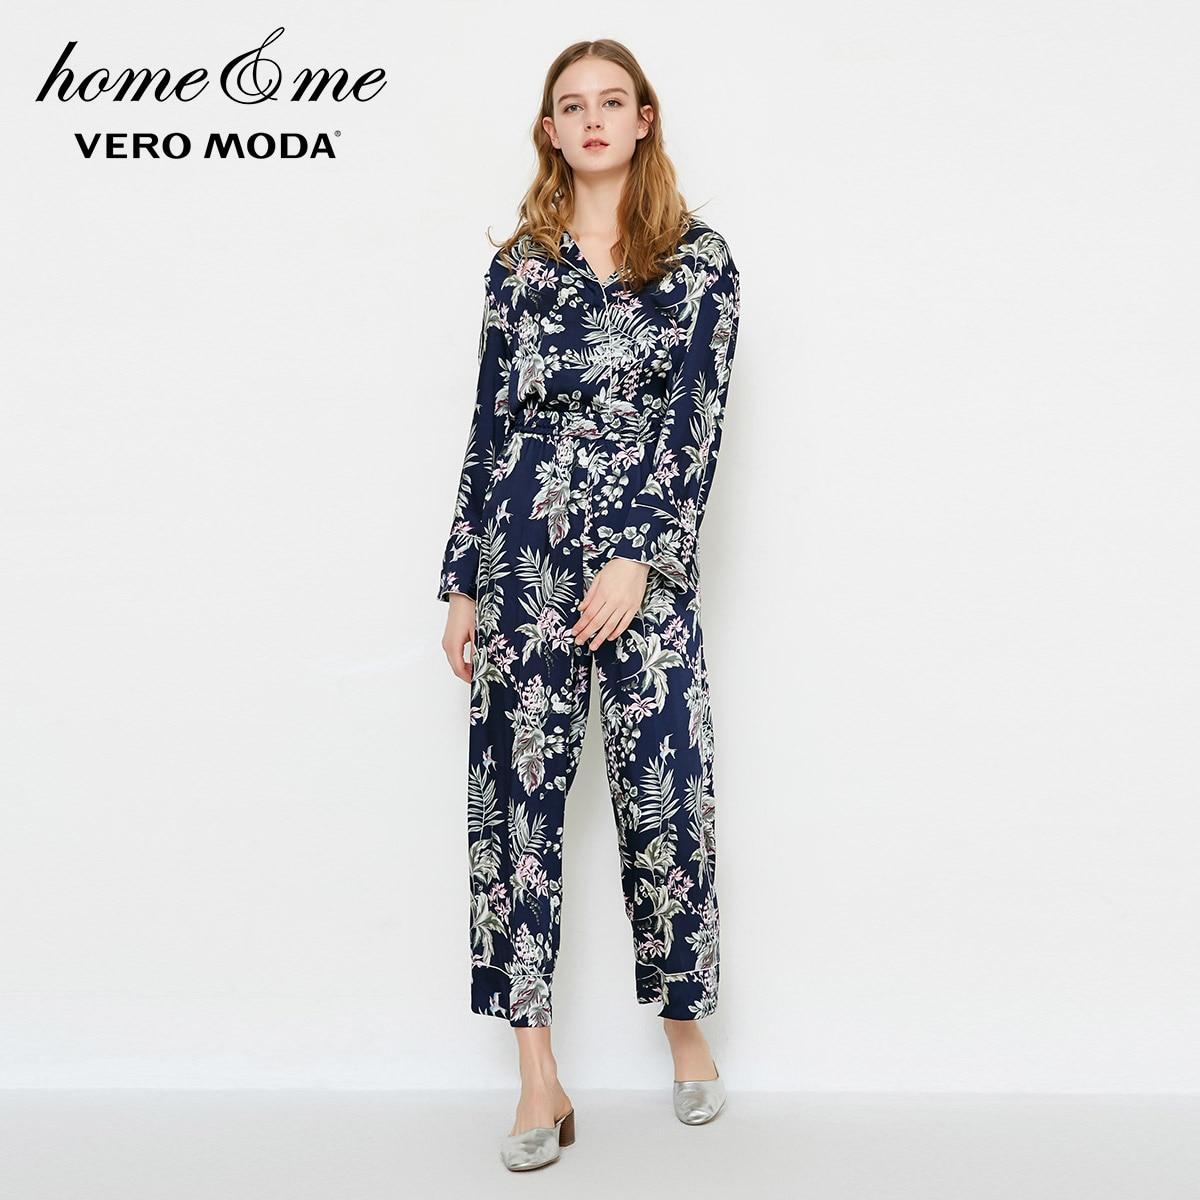 Vero Moda 2019 Women's Spring & Summer Printed Straight Fit Crop Pajama Pants |3182P7503